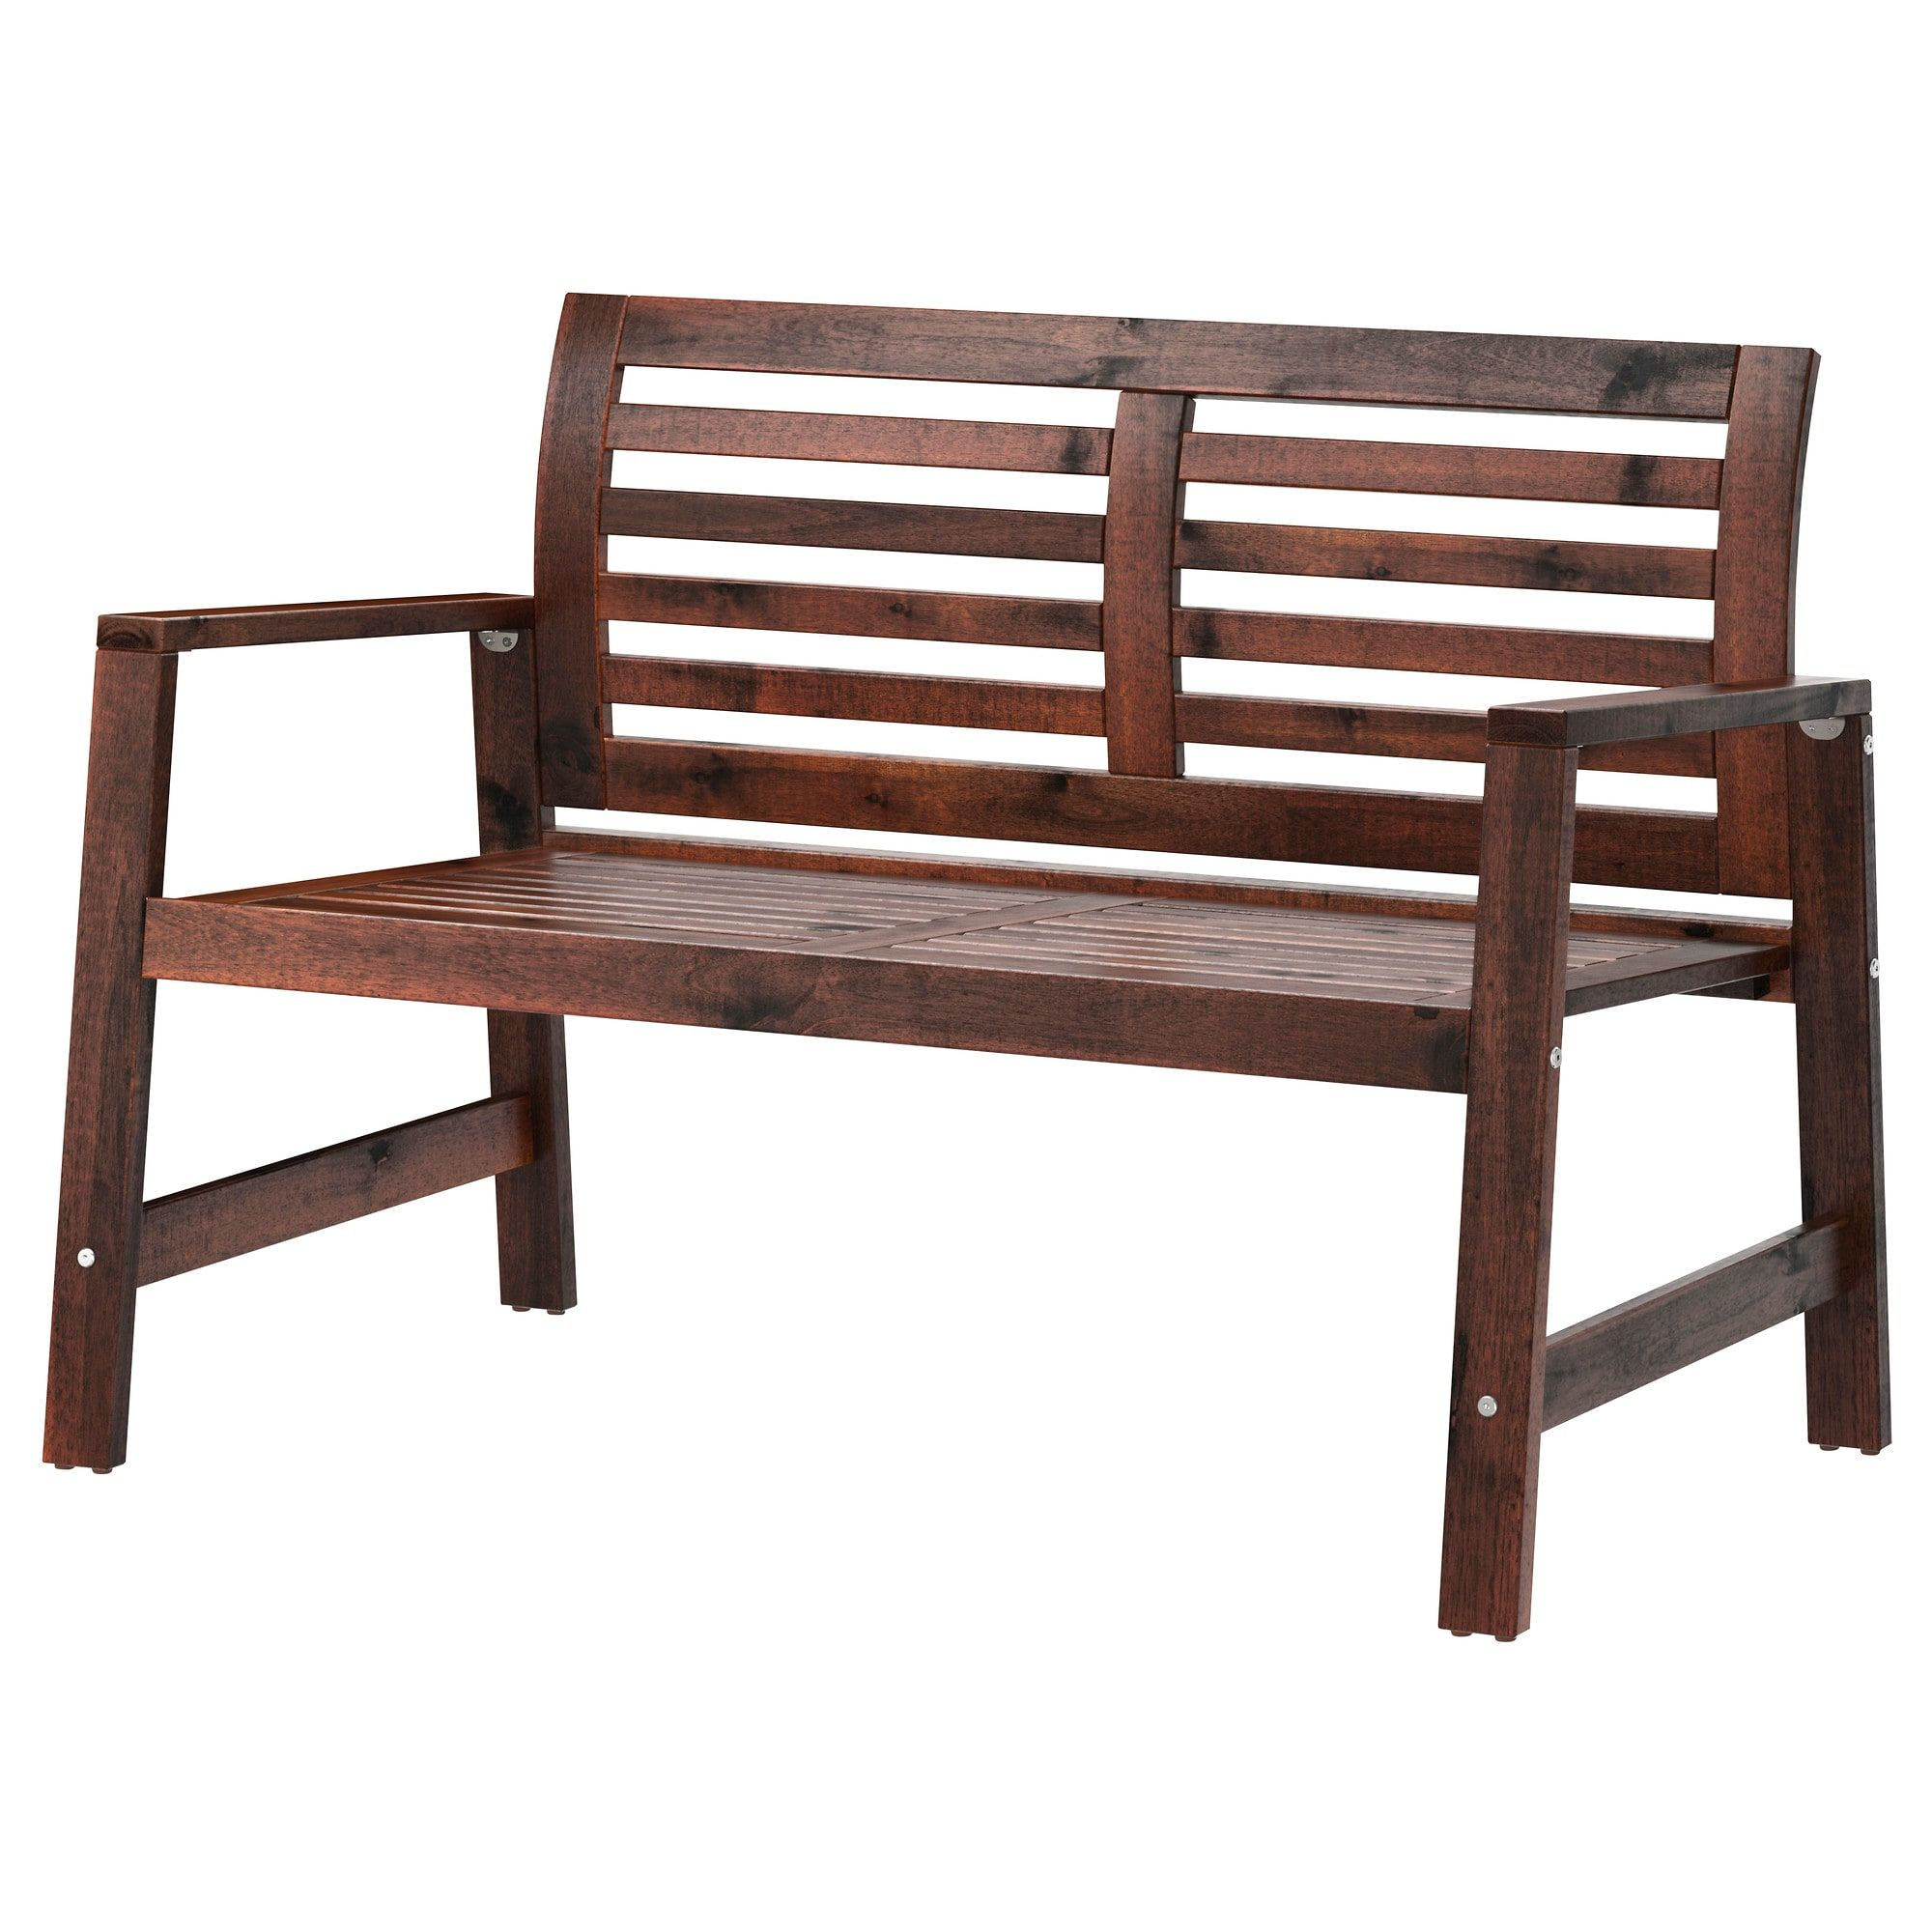 Äpplarö Bench With Backrest, Outdoor - Brown Stained Brown ... pour Banc De Jardin Ikea